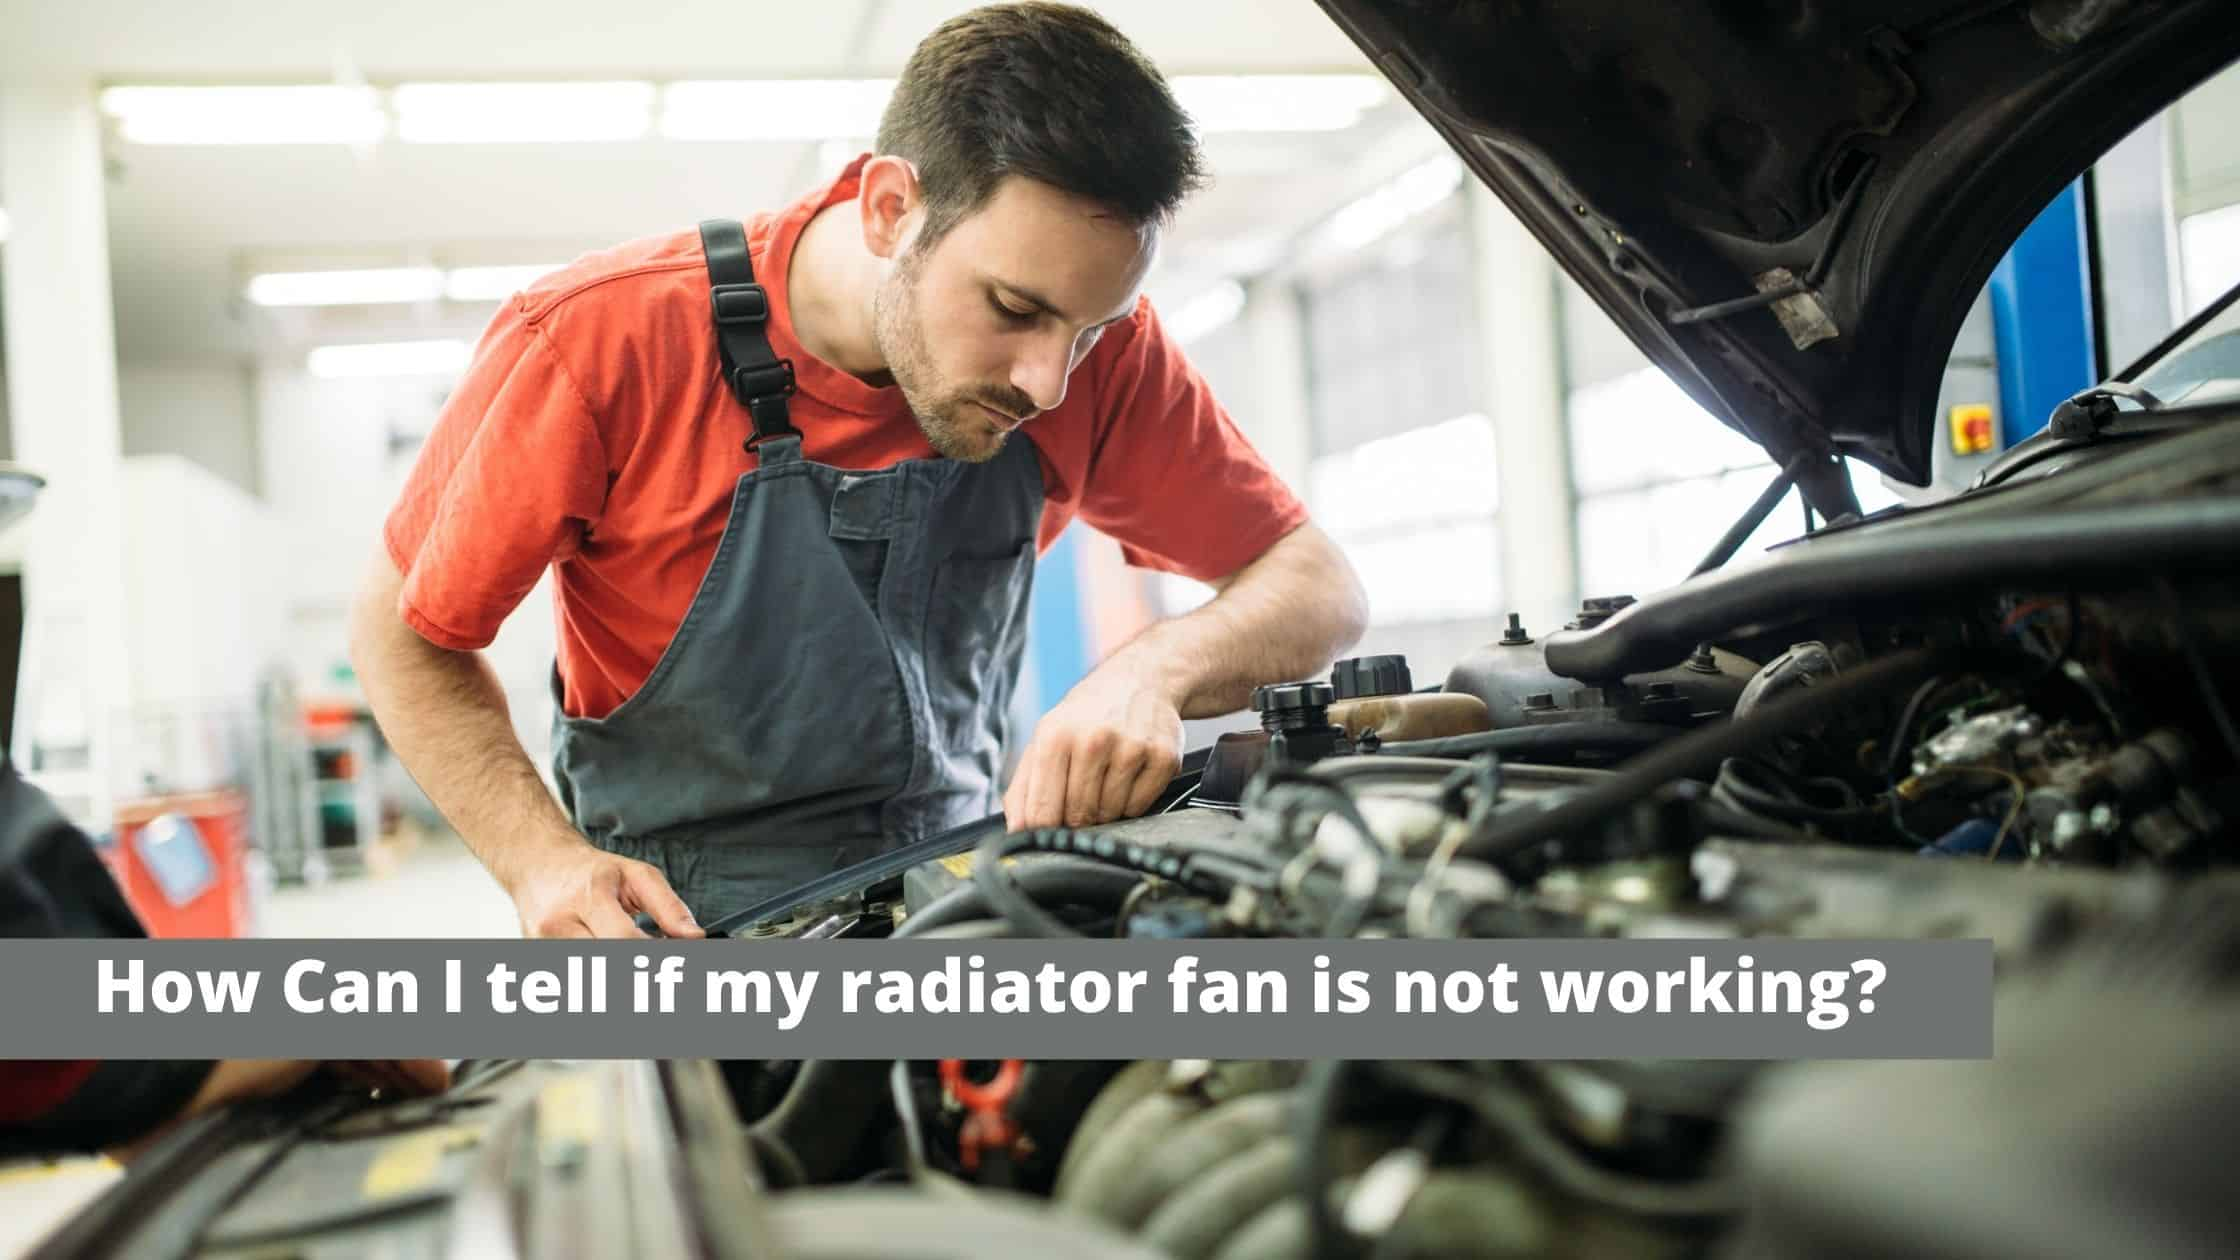 Symptoms of a bad or failing radiator fan